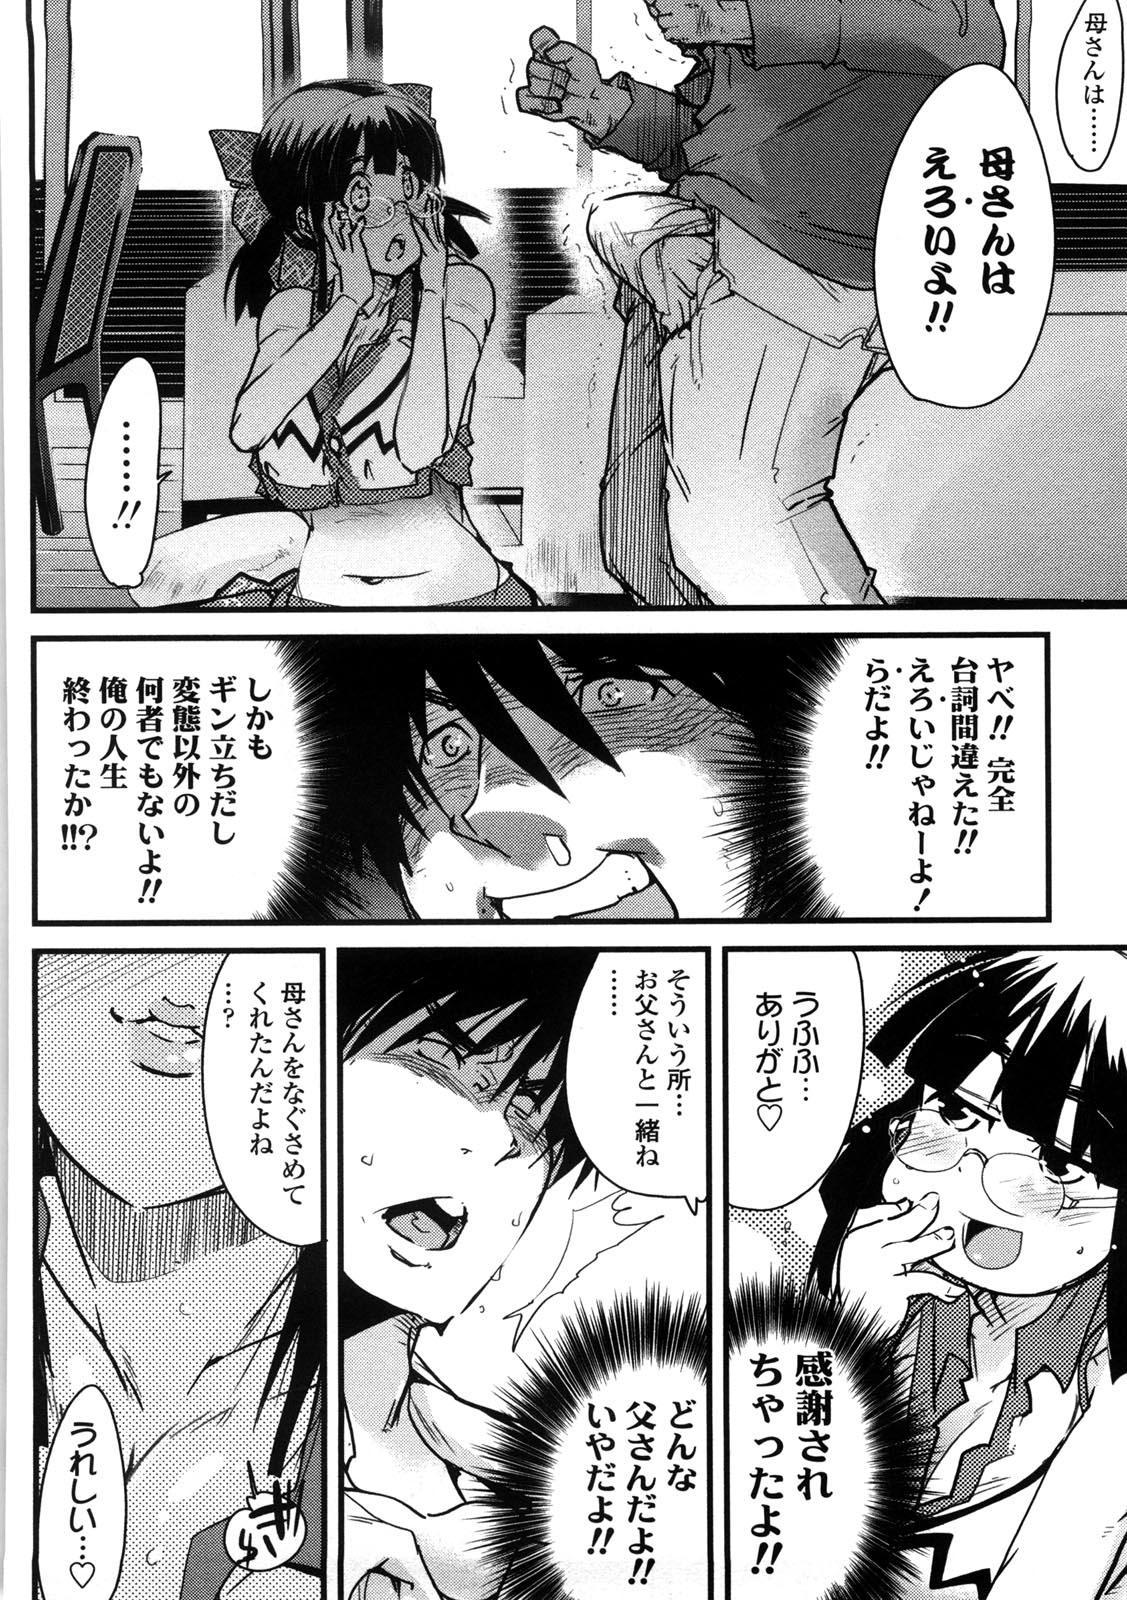 One Shota One! 138